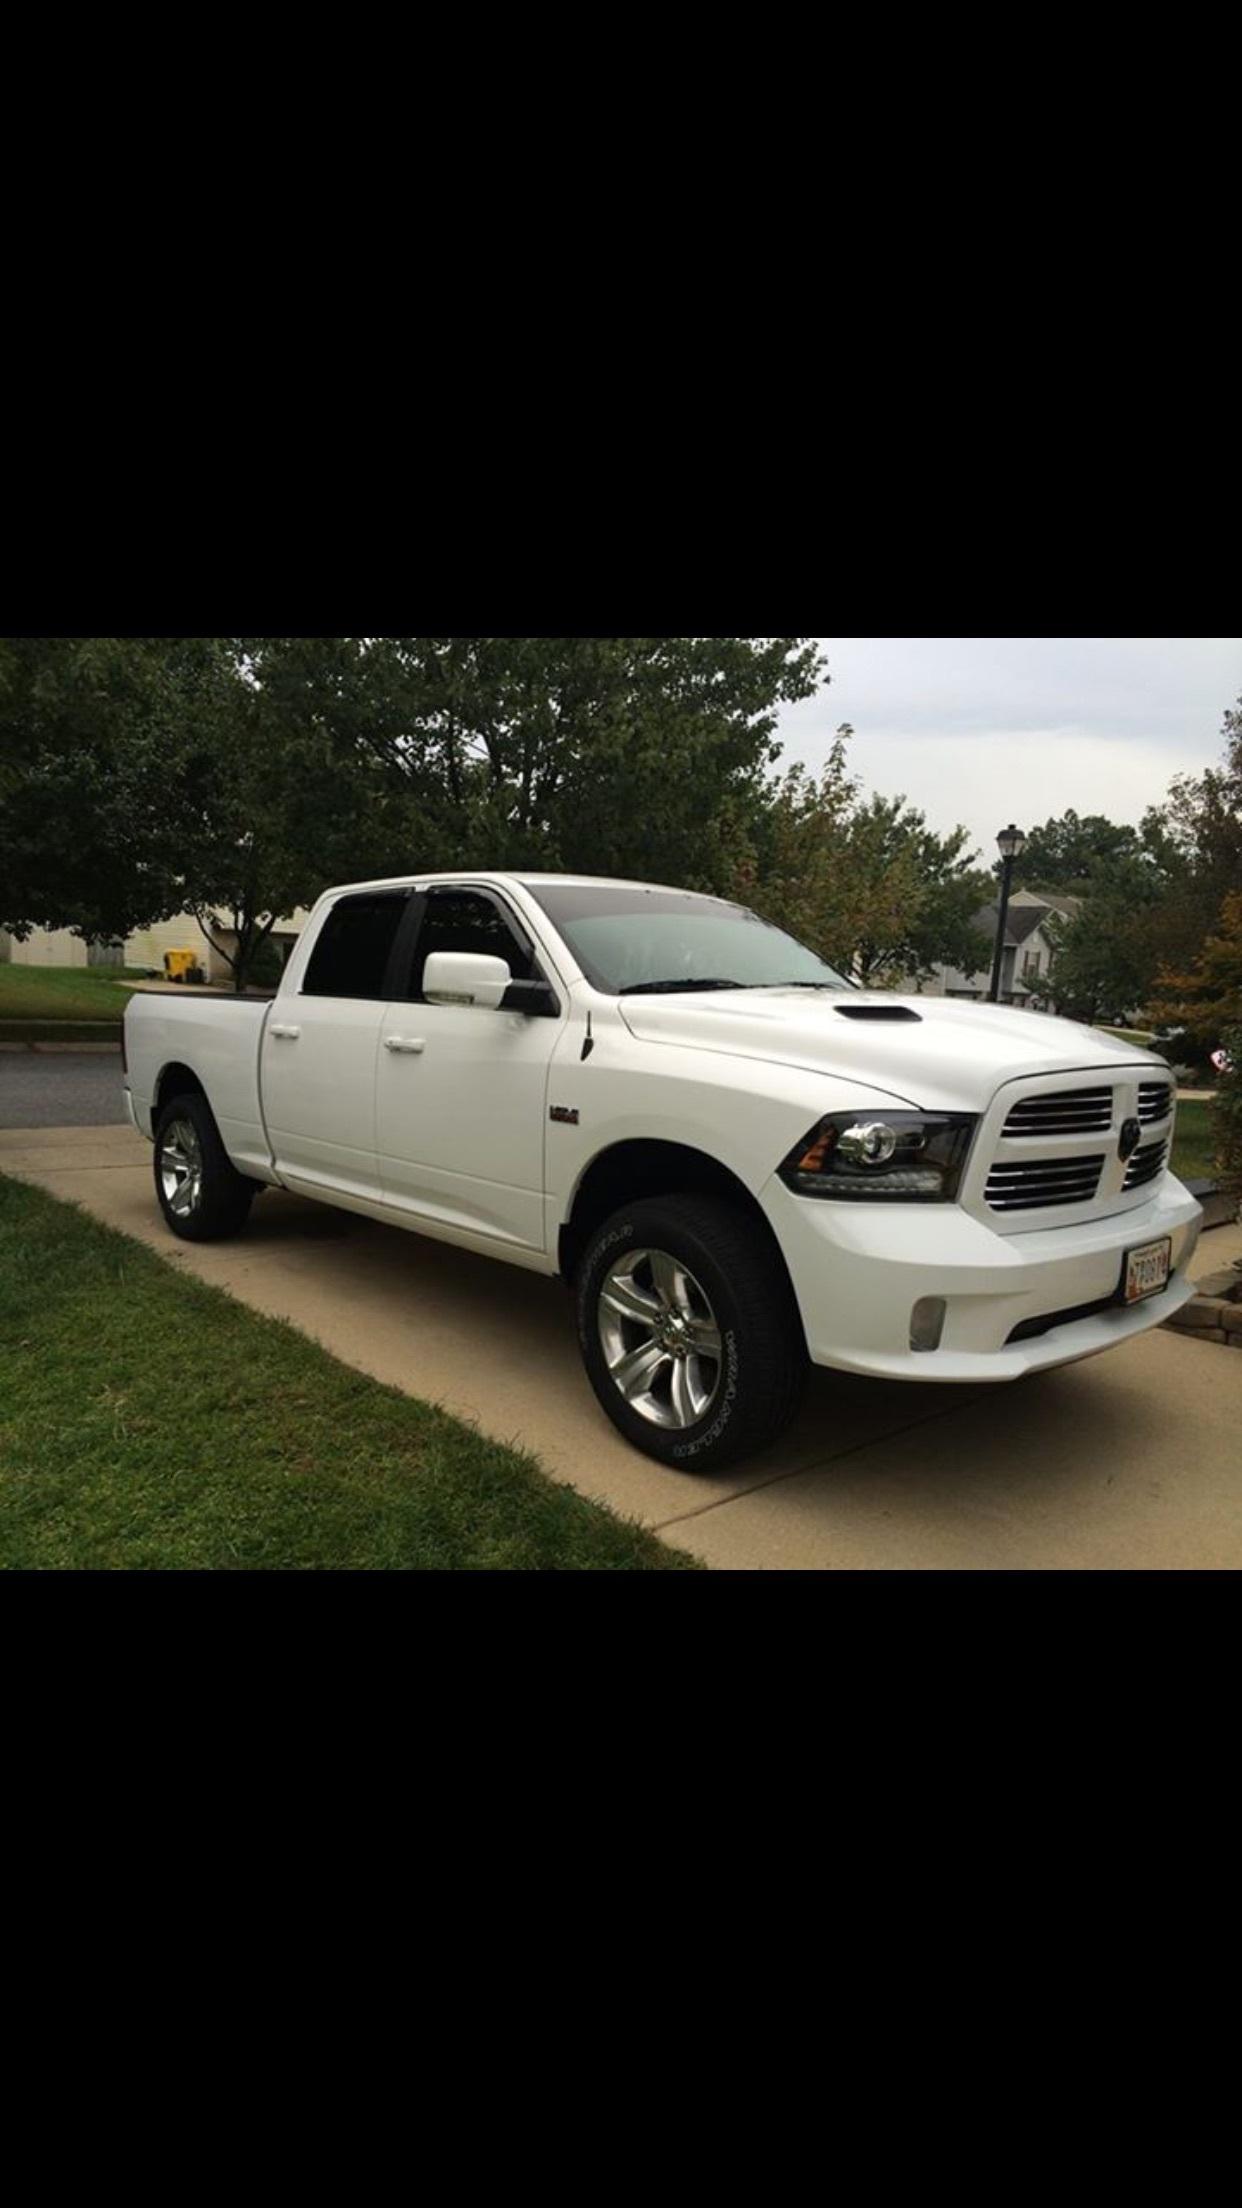 2014 White Dodge Ram 1500 Sport Crew Cab Pictures Mods Upgrades Wallpaper Dragtimes Com